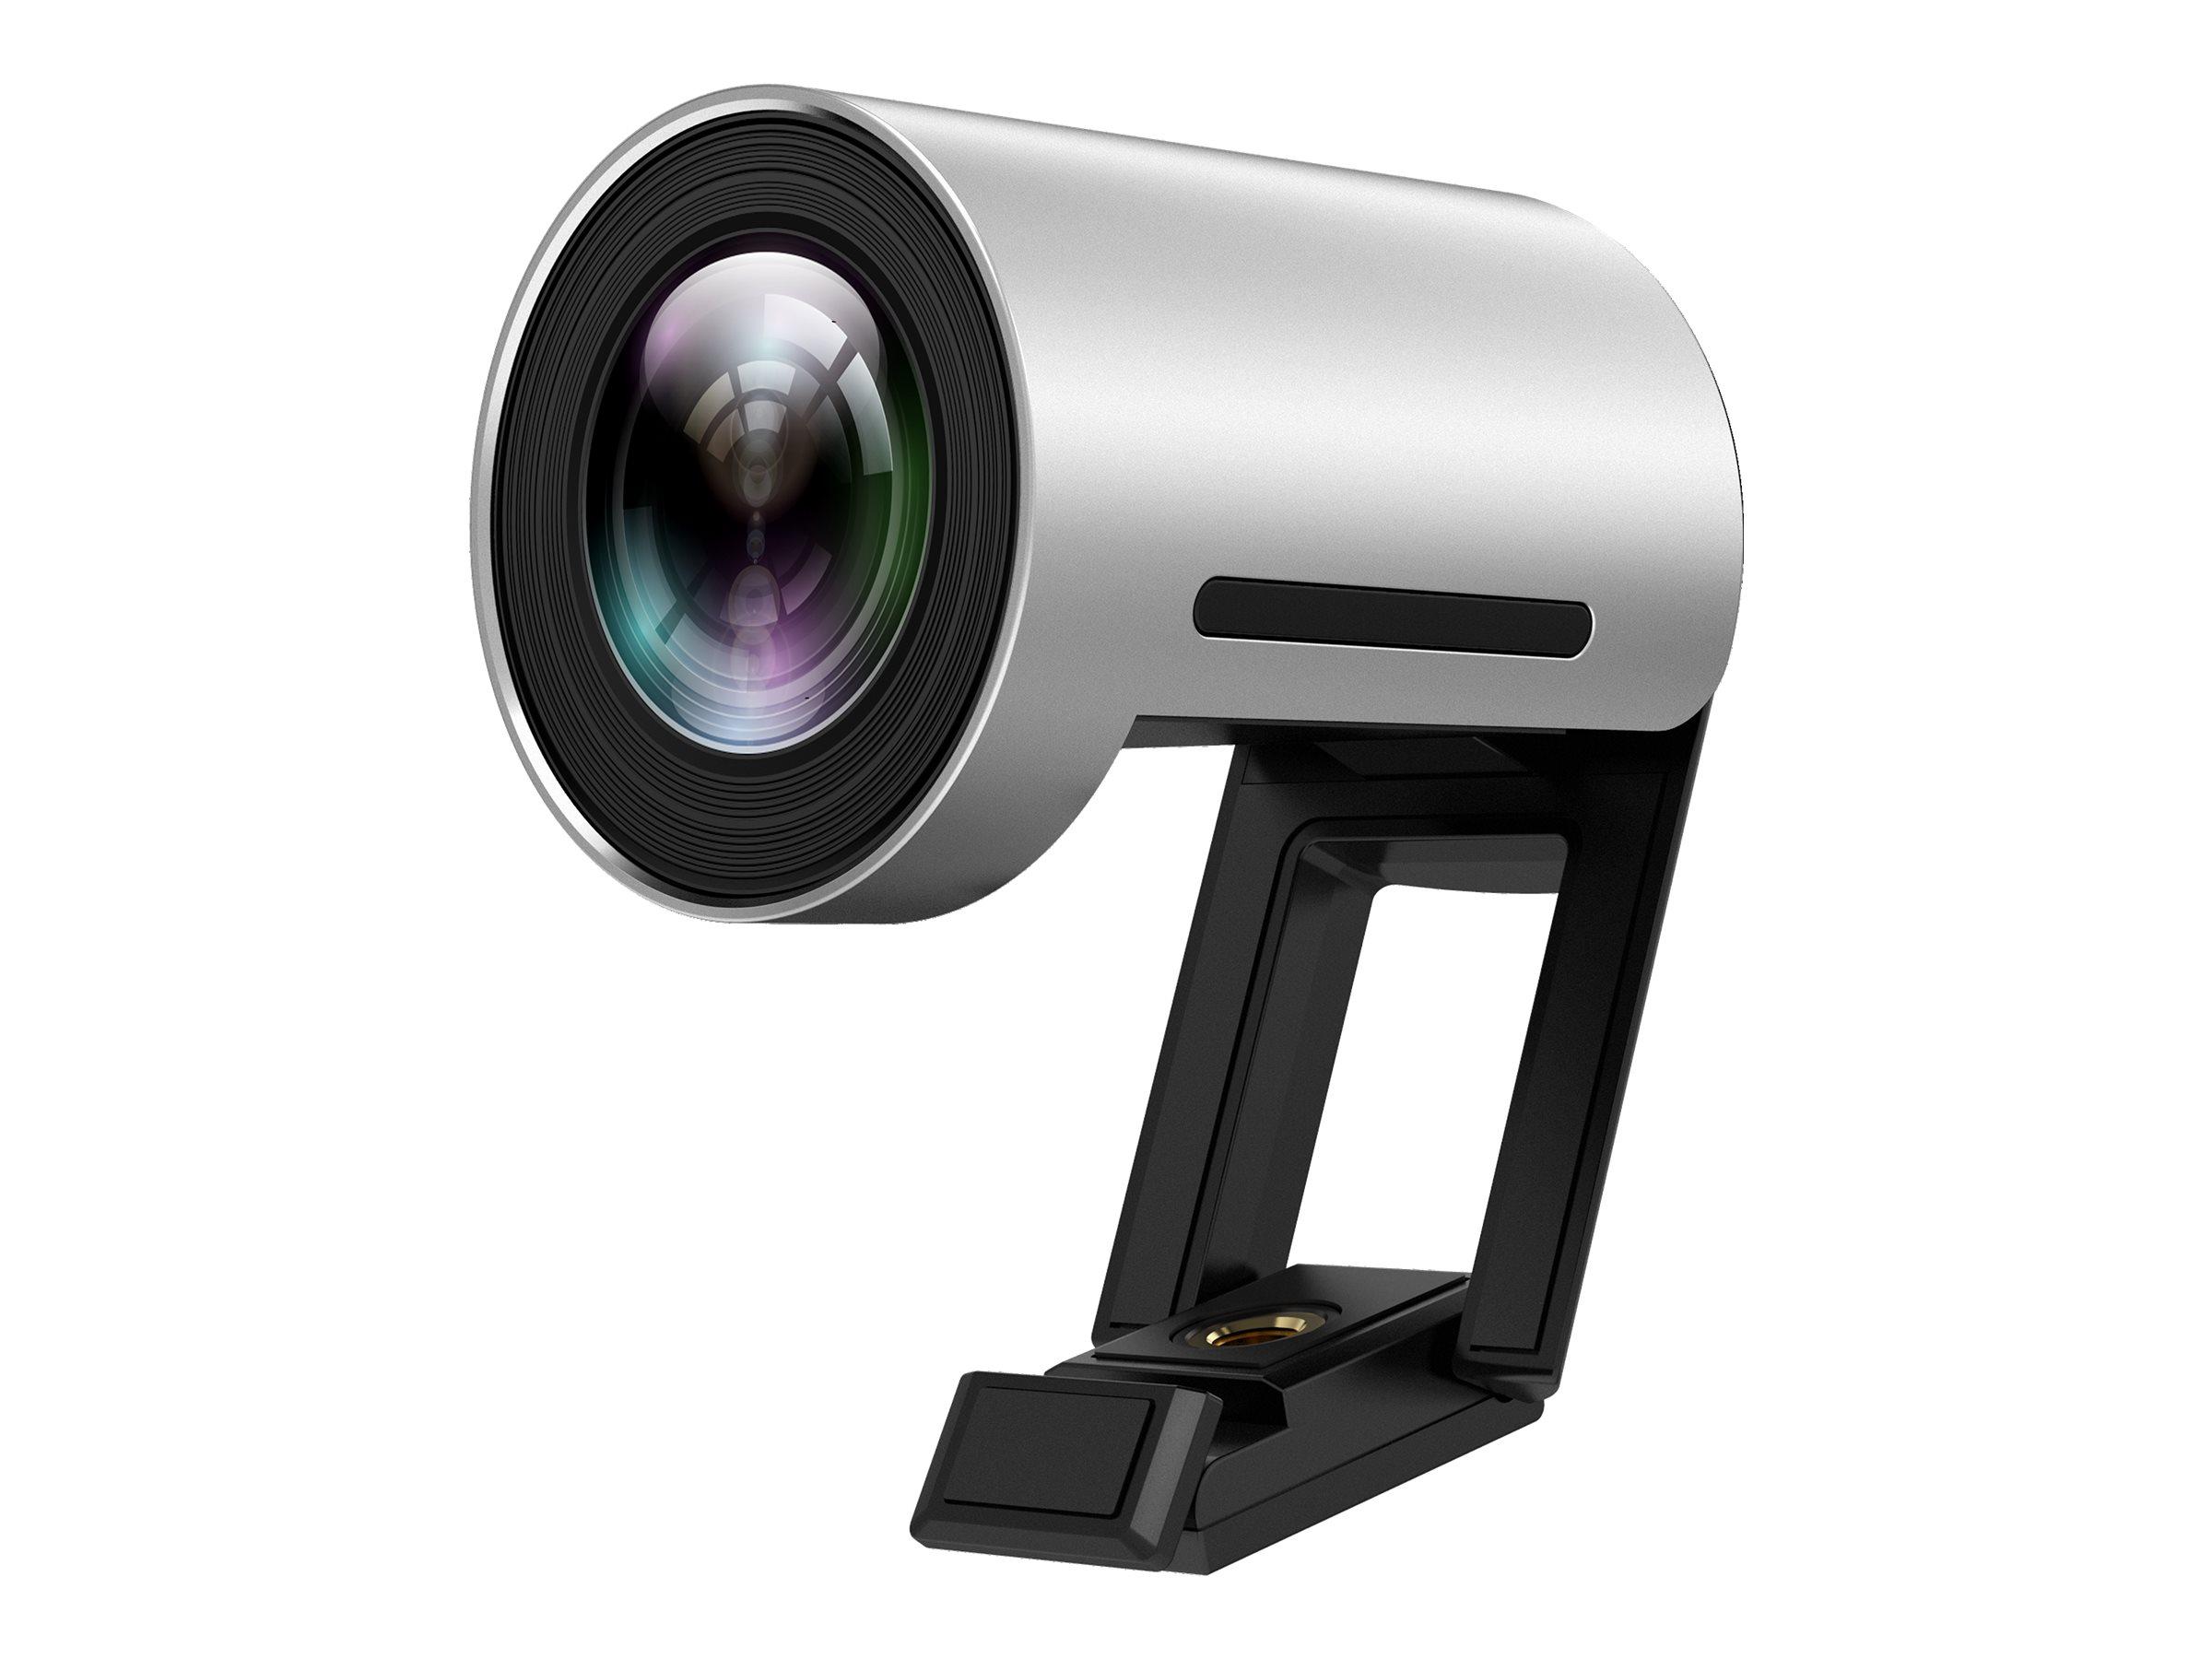 Yealink UVC30 Room - Konferenzkamera - Farbe (Tag&Nacht) - 8.510.000 Pixel - feste Brennweite - USB 2.0